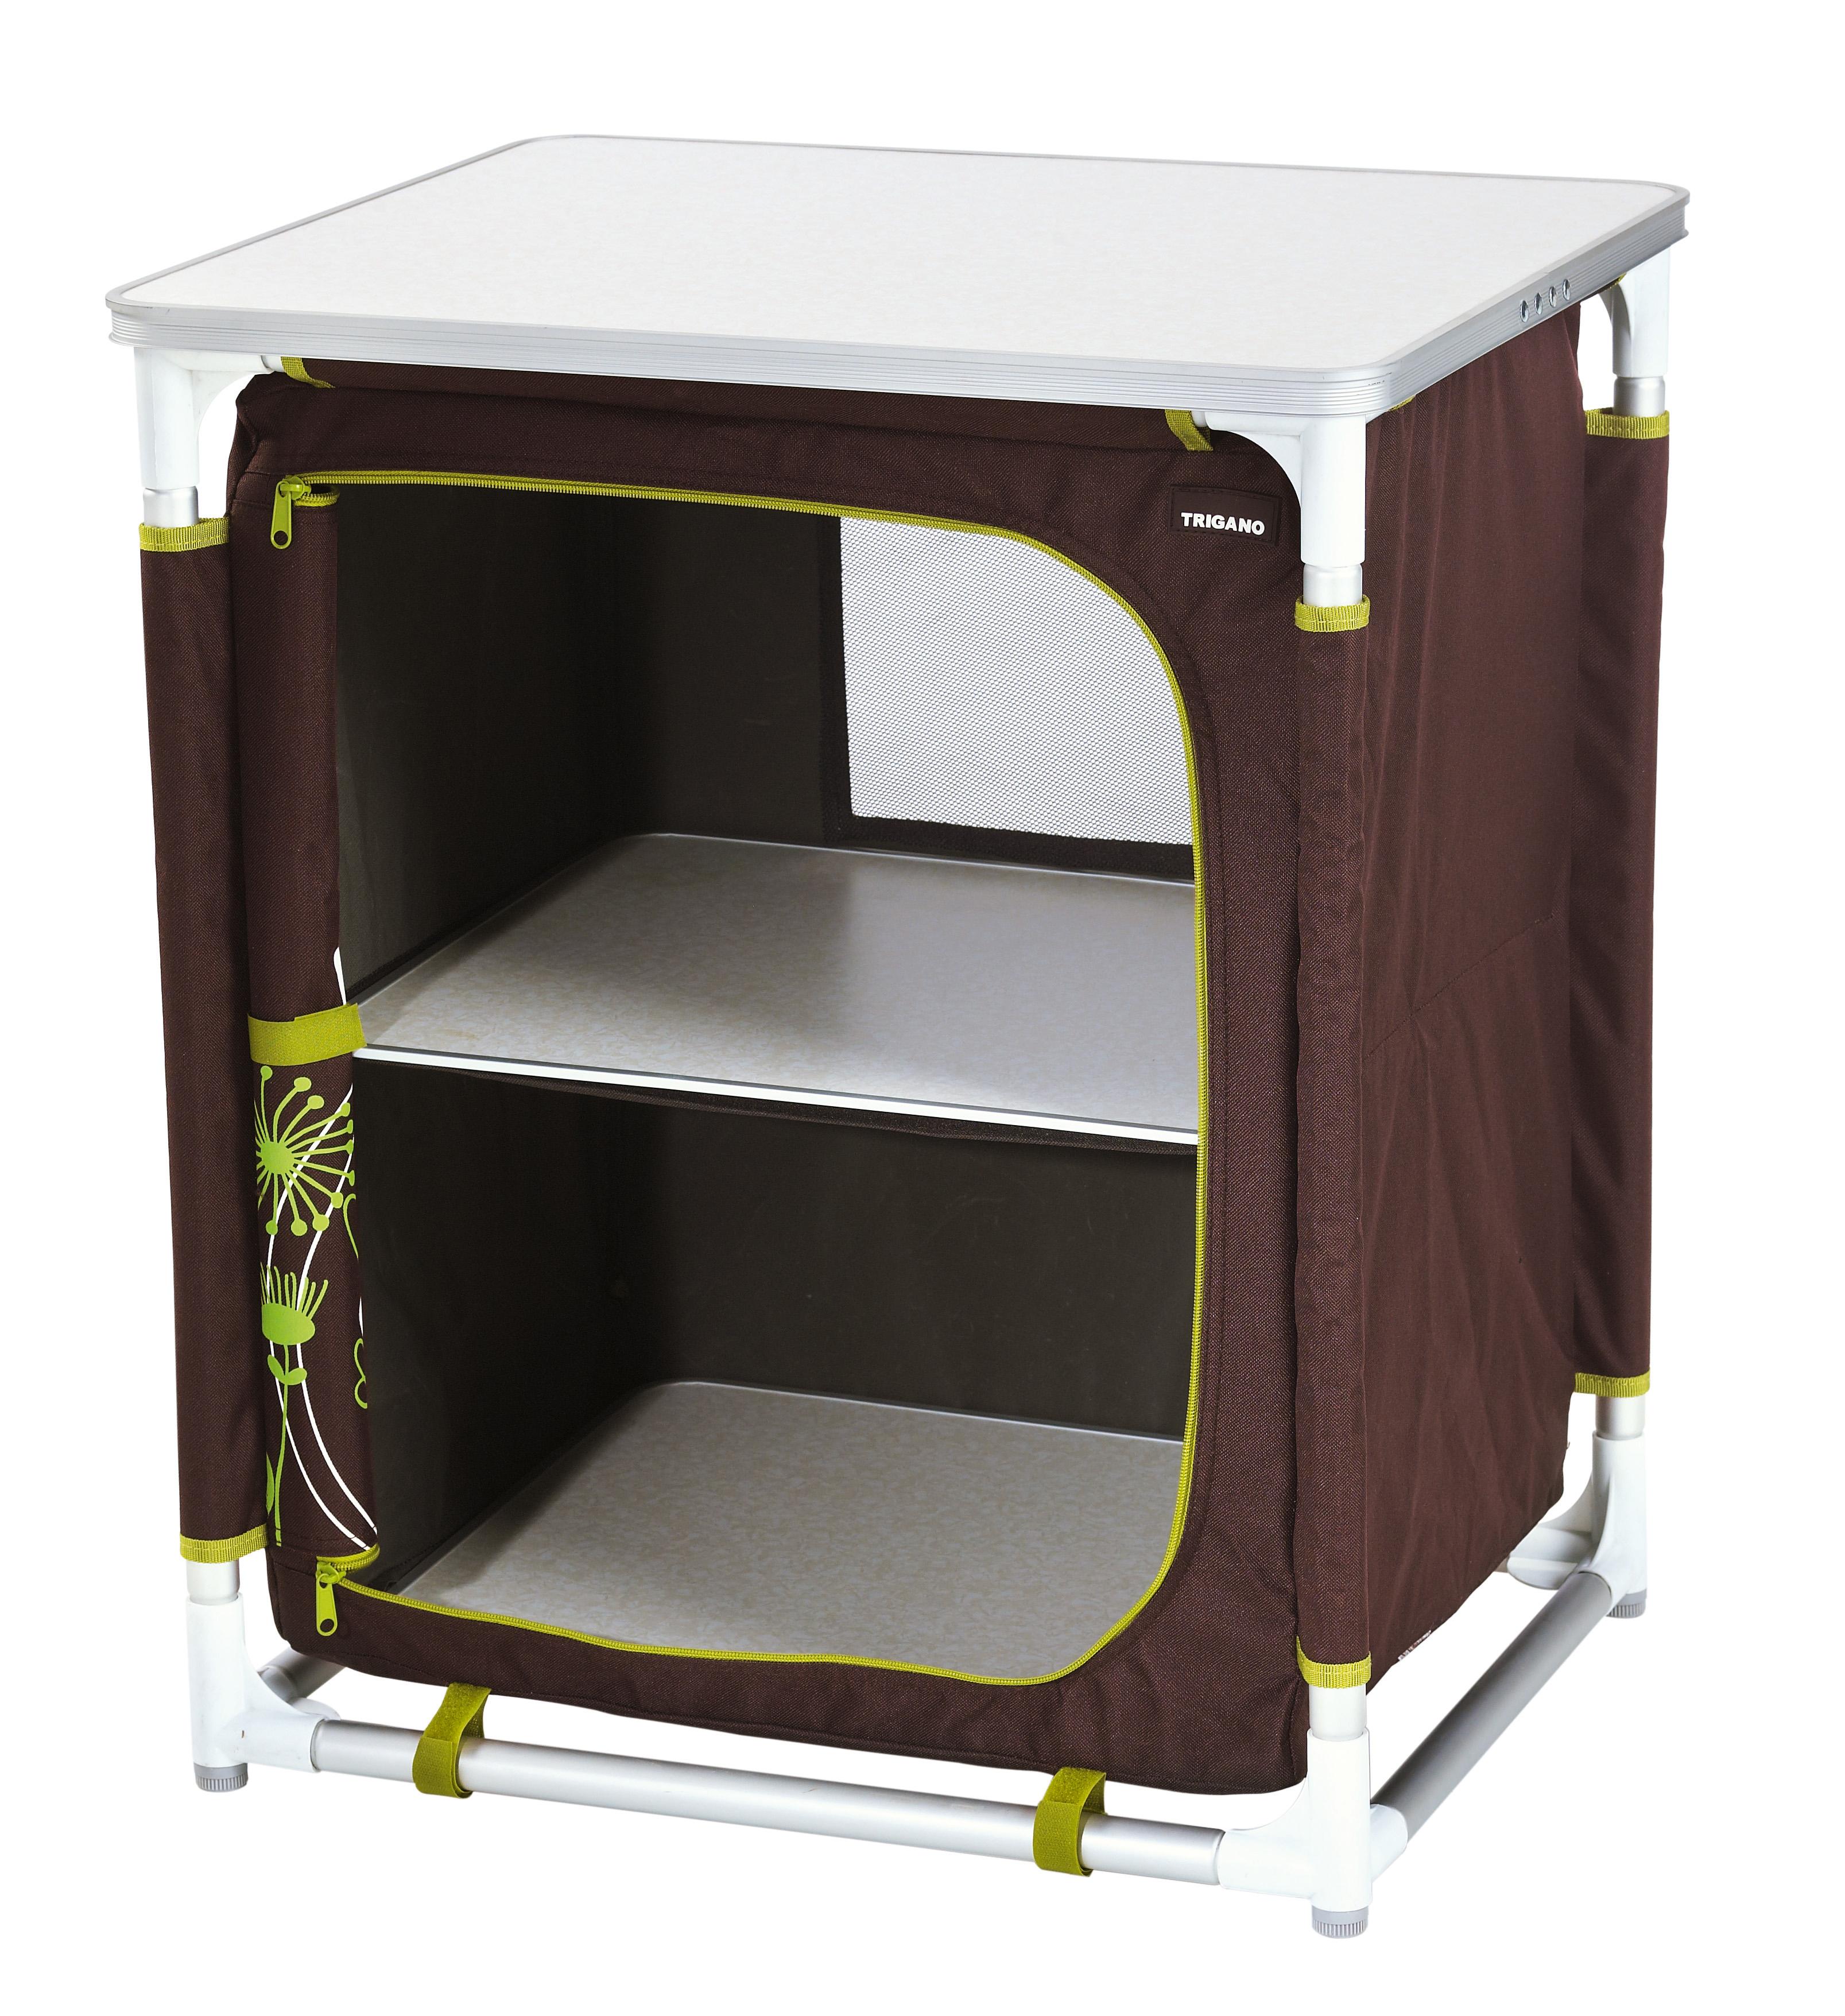 meubles de rangement bretagne caravane. Black Bedroom Furniture Sets. Home Design Ideas